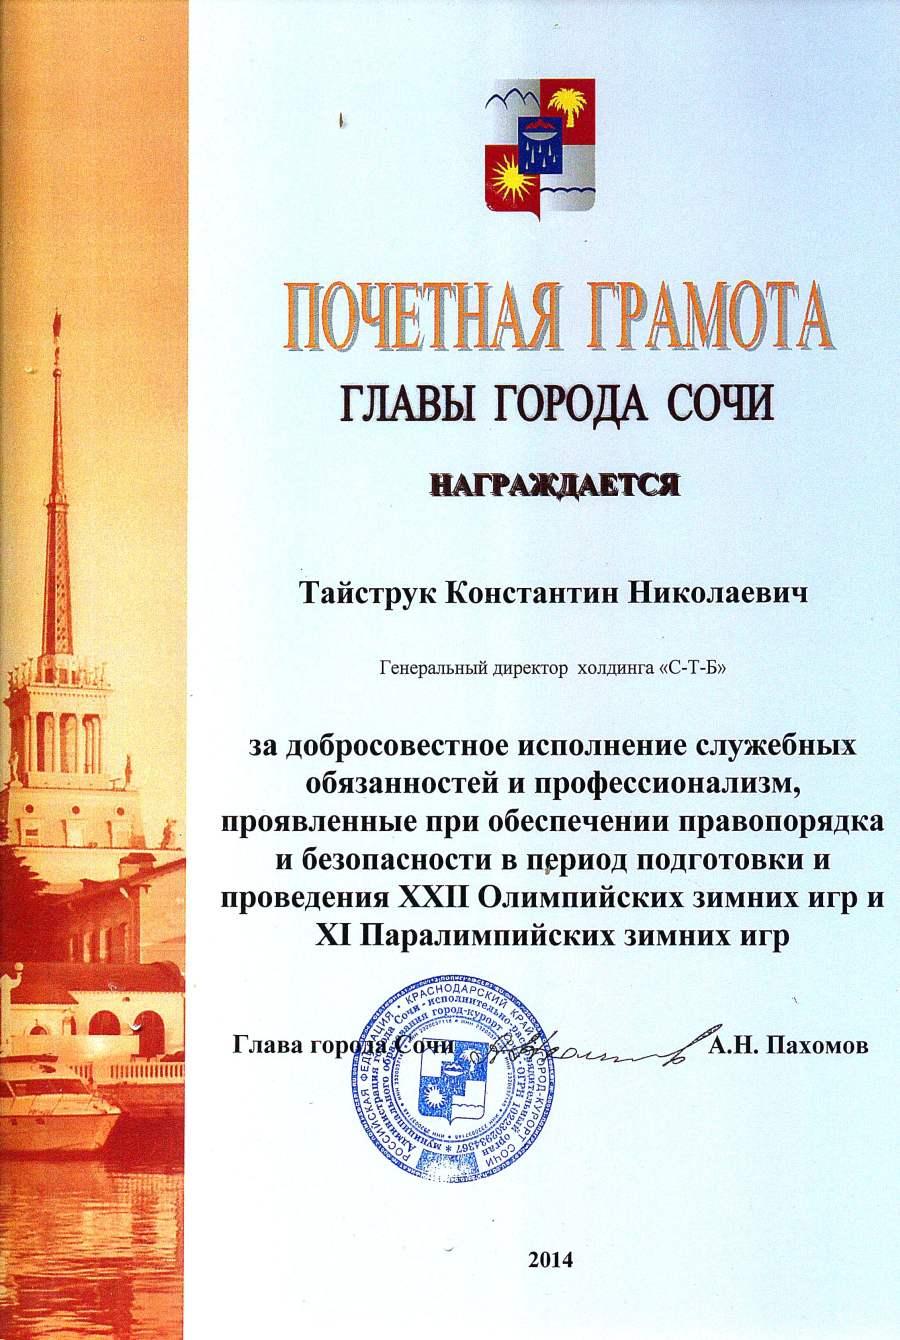 Глава города Пахомов А.Н.